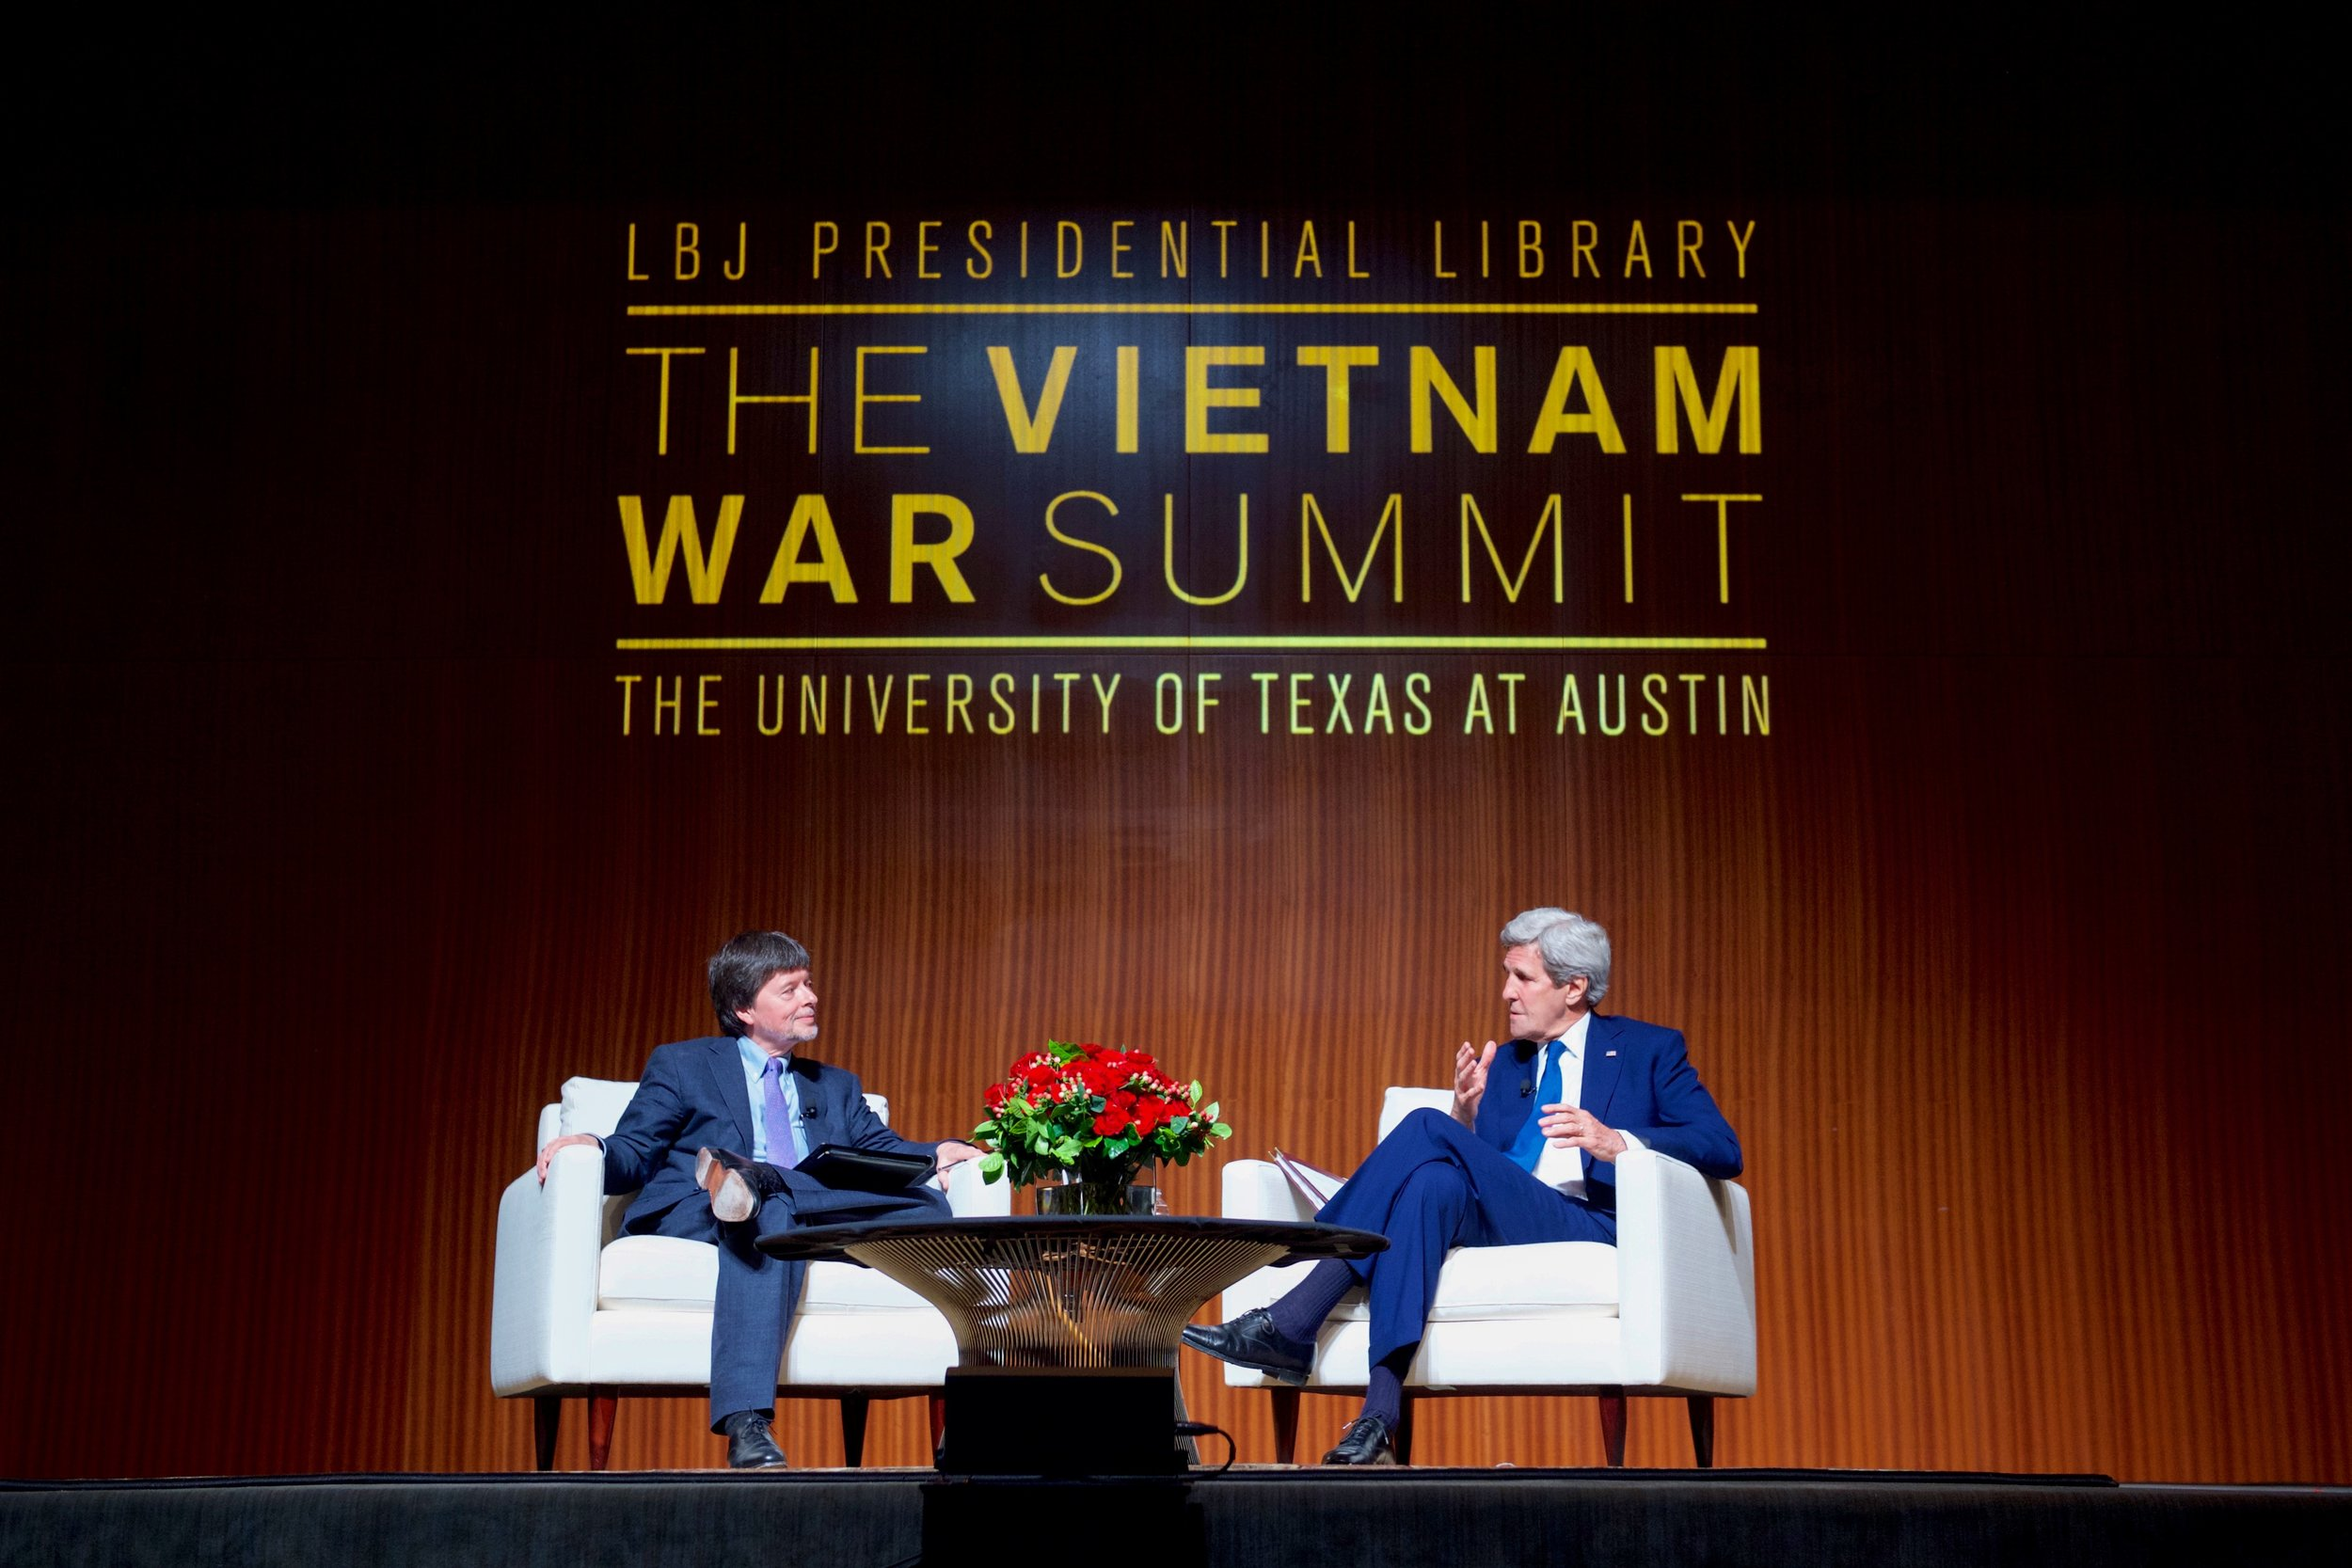 John Kerry talks with historian and filmmaker Ken Burns during a symposium focused on the Vietnam War.